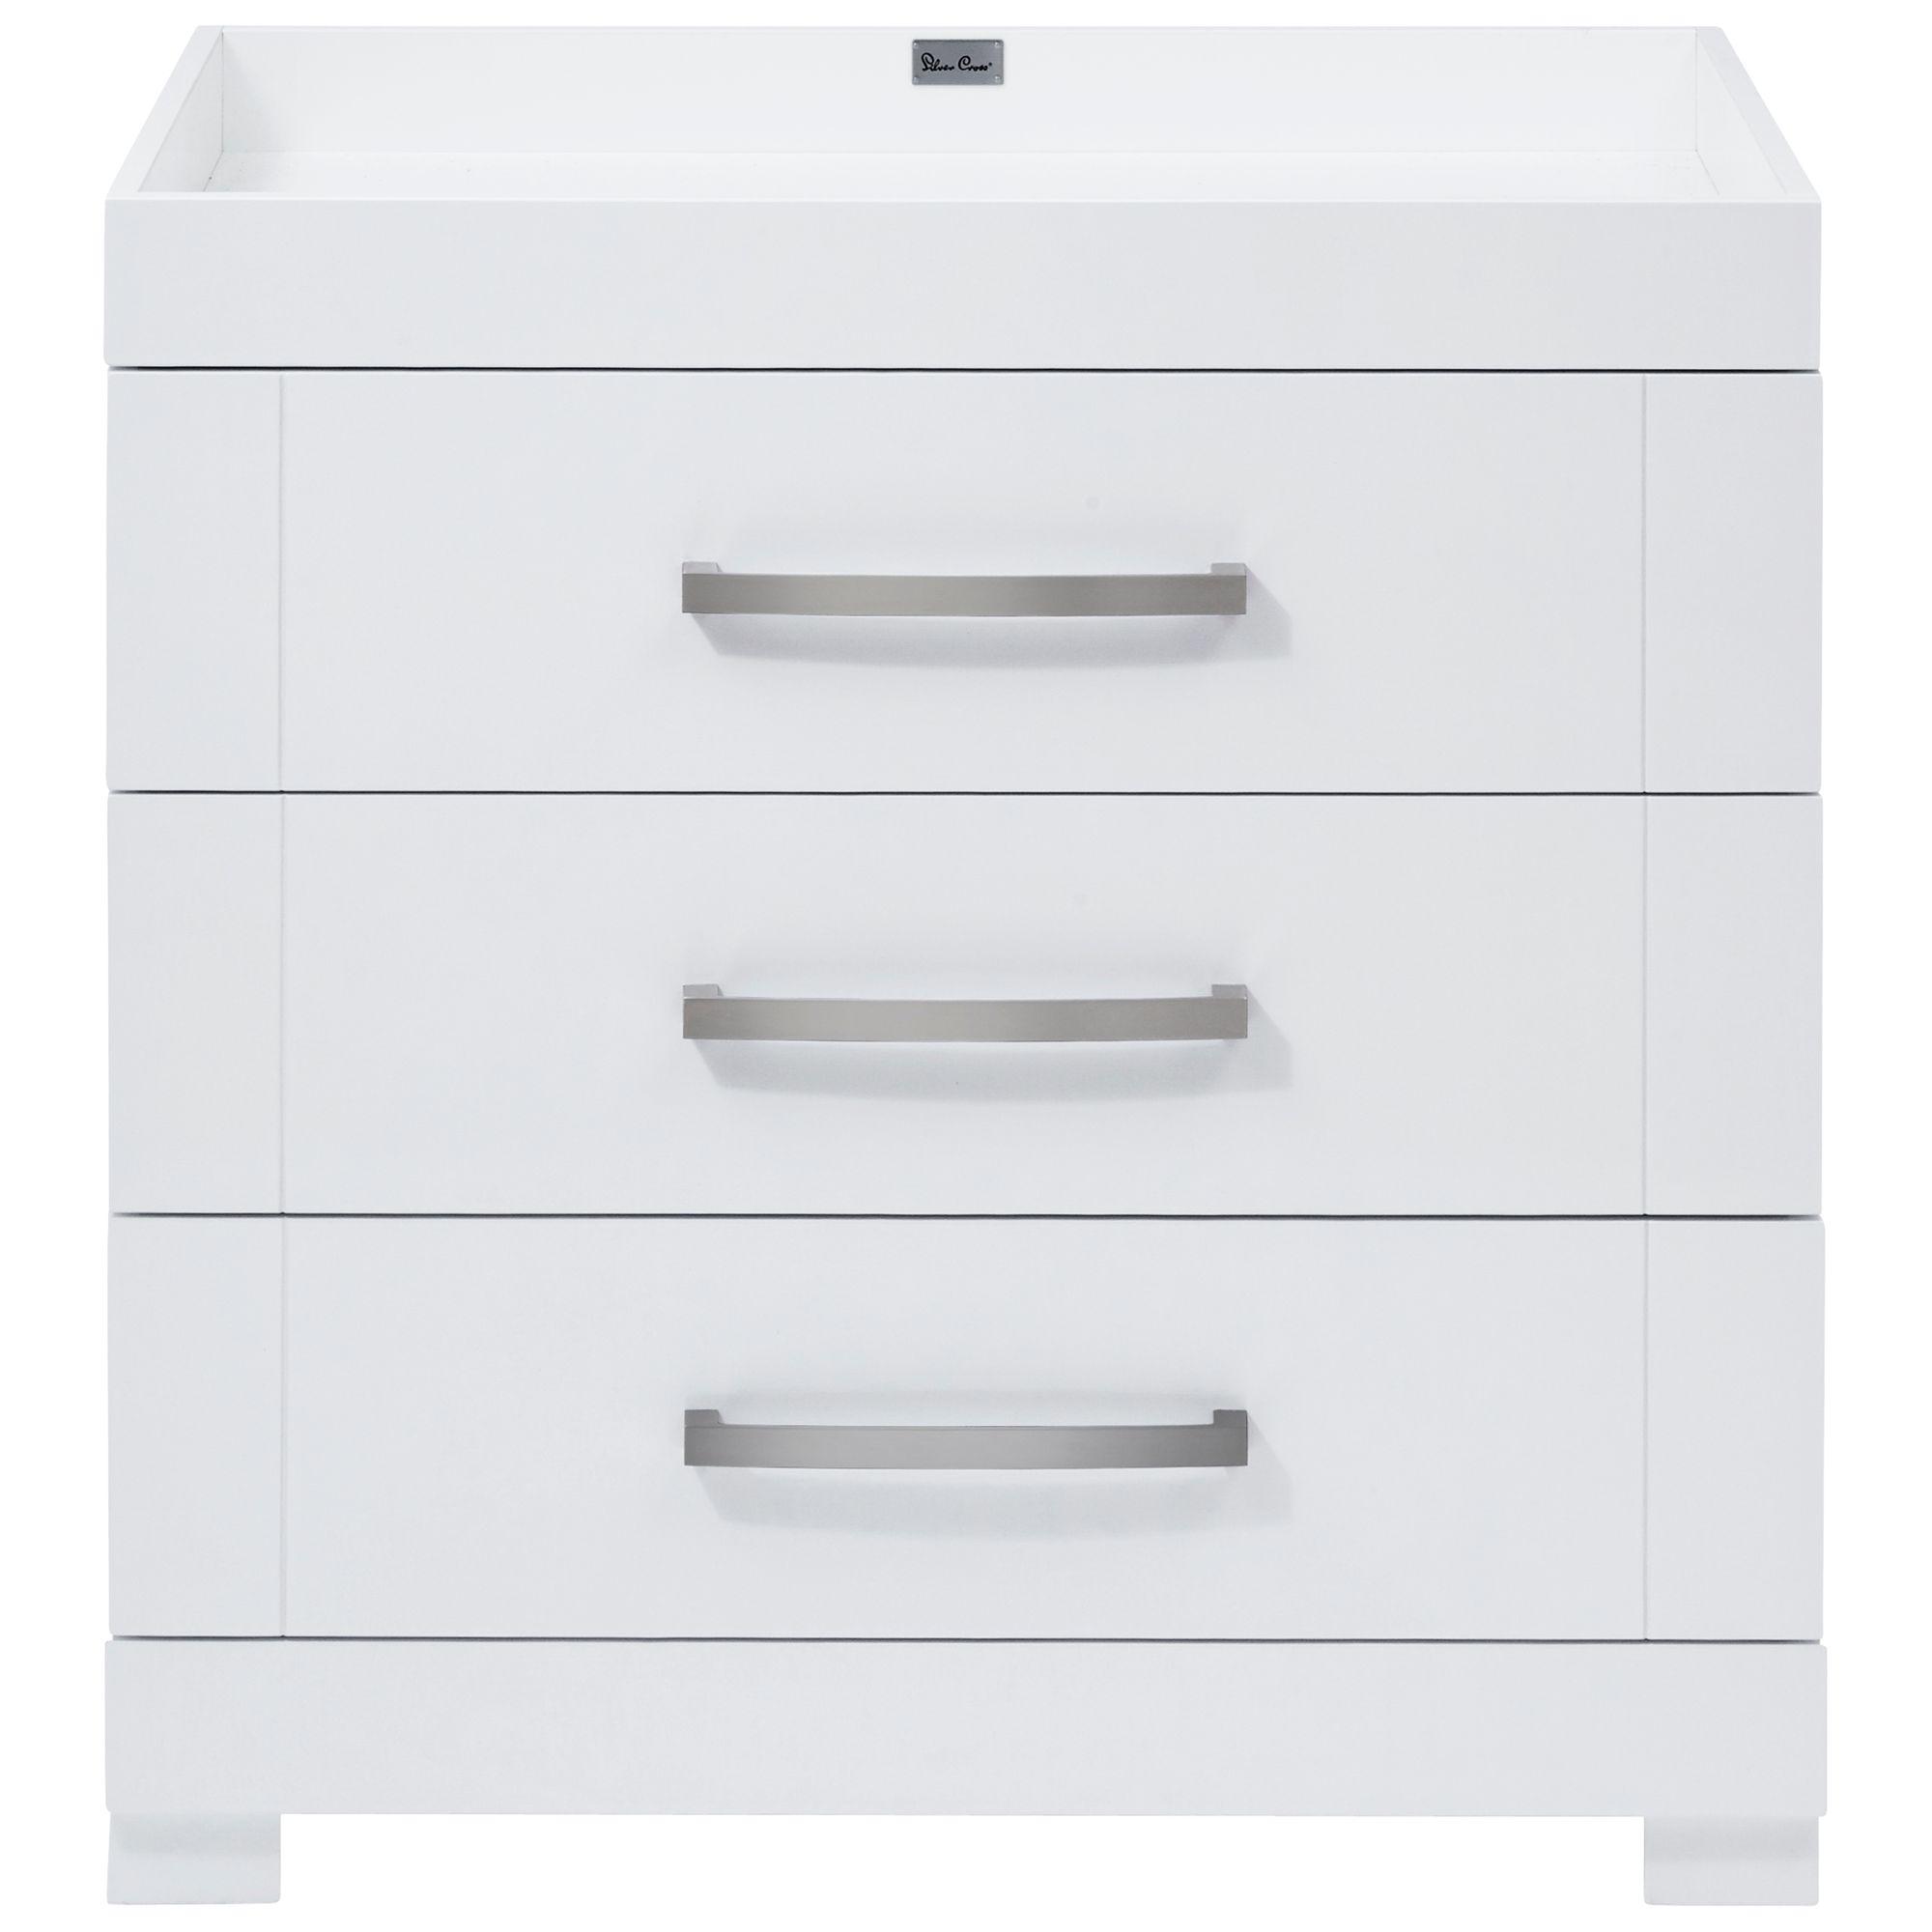 Silver Cross Silver Cross Notting Hill Dresser, Gloss White